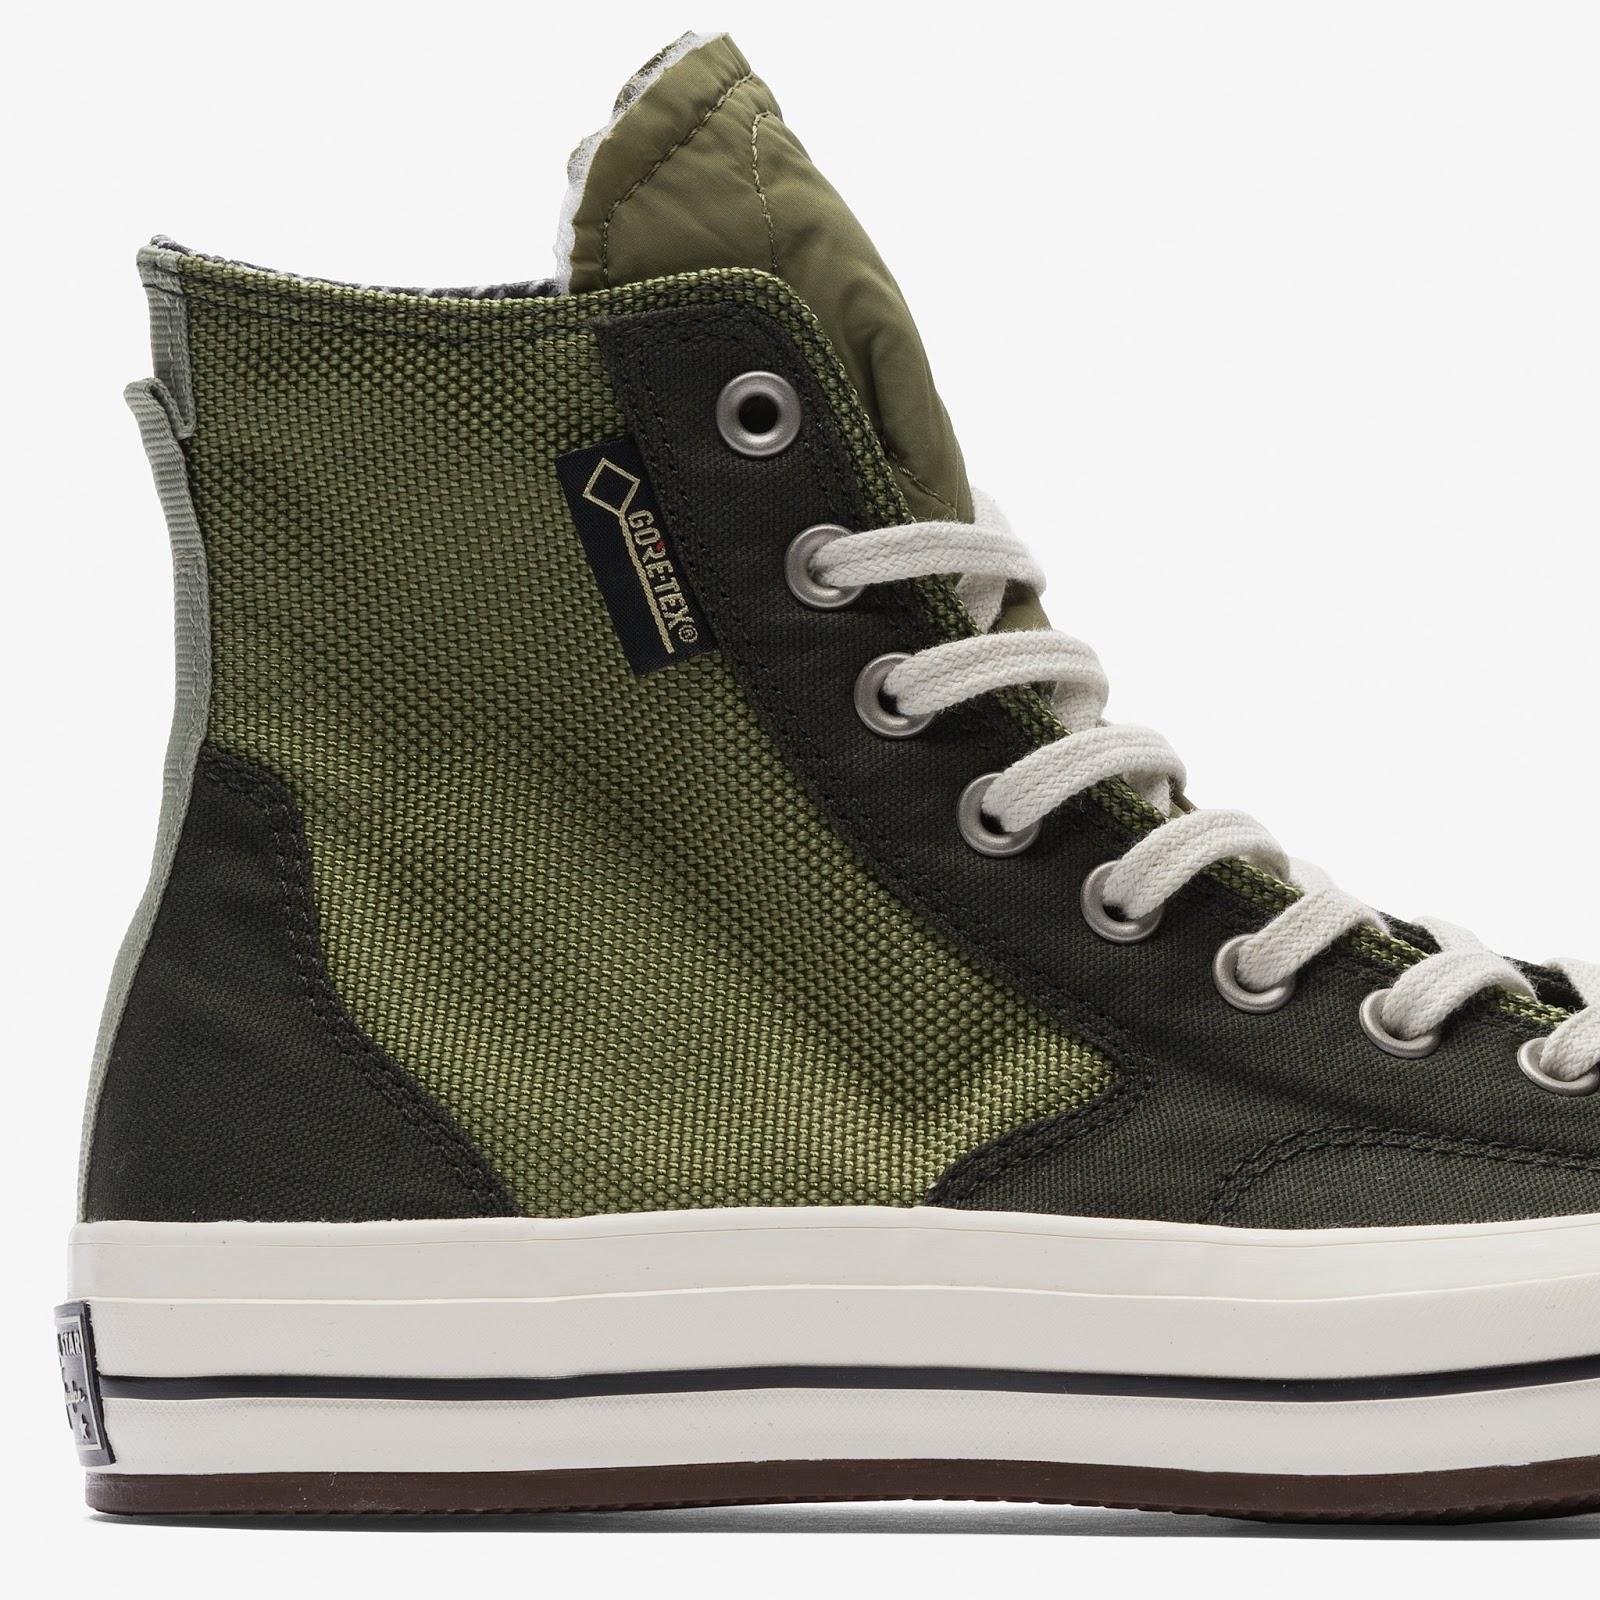 2a3bfd0fa3a Tech Chuck  Converse Slam Jam CT70 Hiker Hi Sneaker